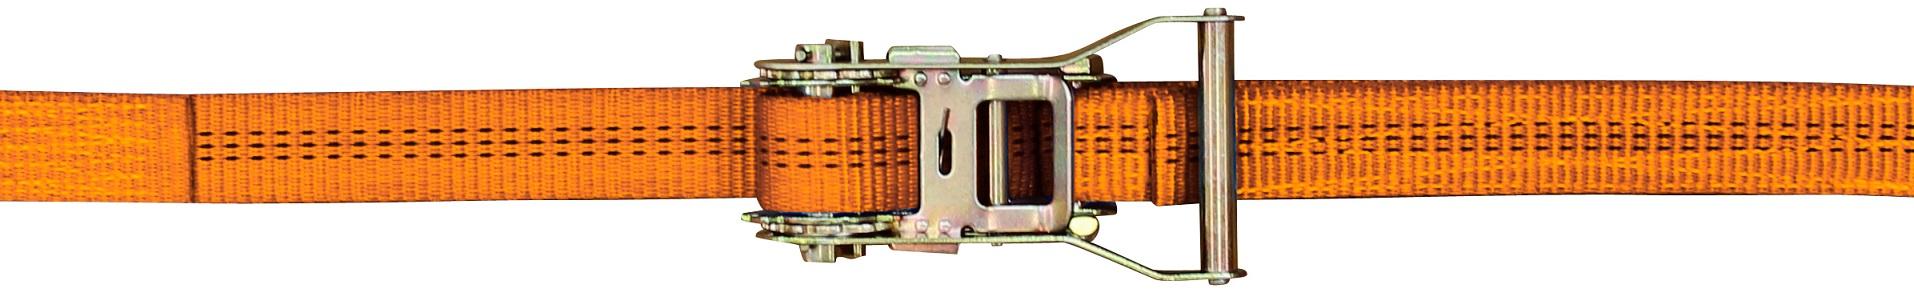 Ratschengurt 35 mm | 1.500 daN